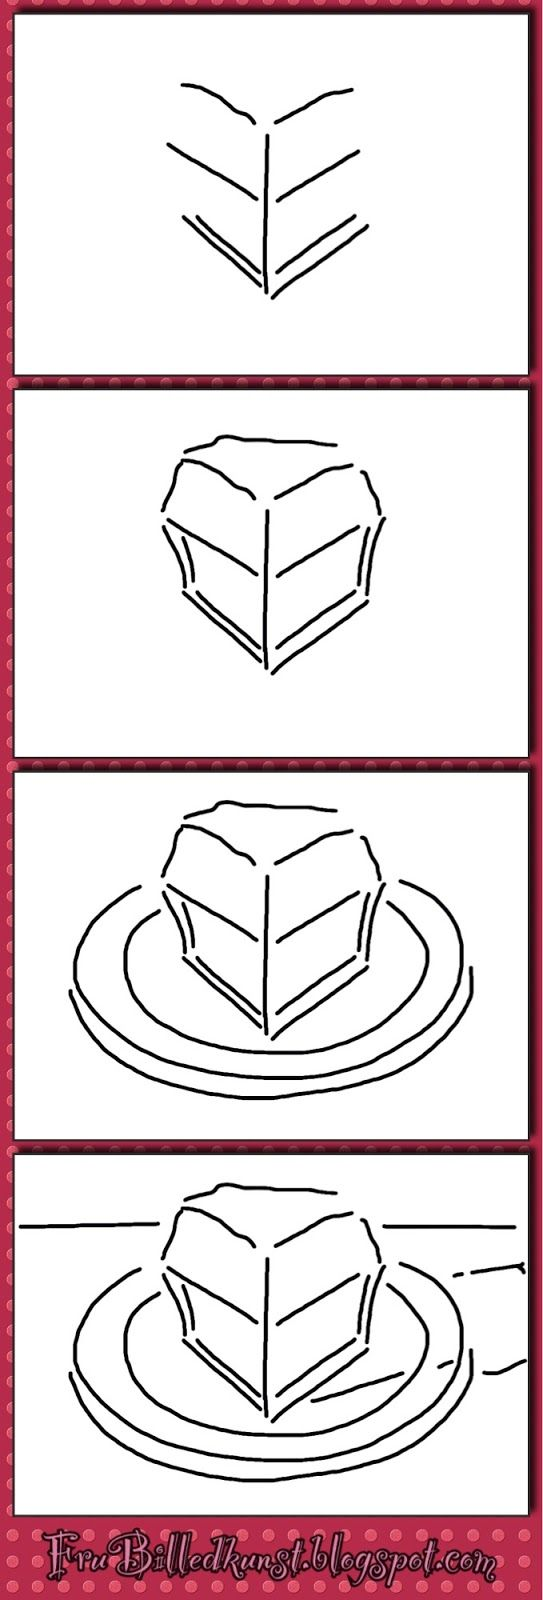 Wayne Thiebaud Art Activities - how to draw ice cream cones, cake slices, cupcakes, glasses.